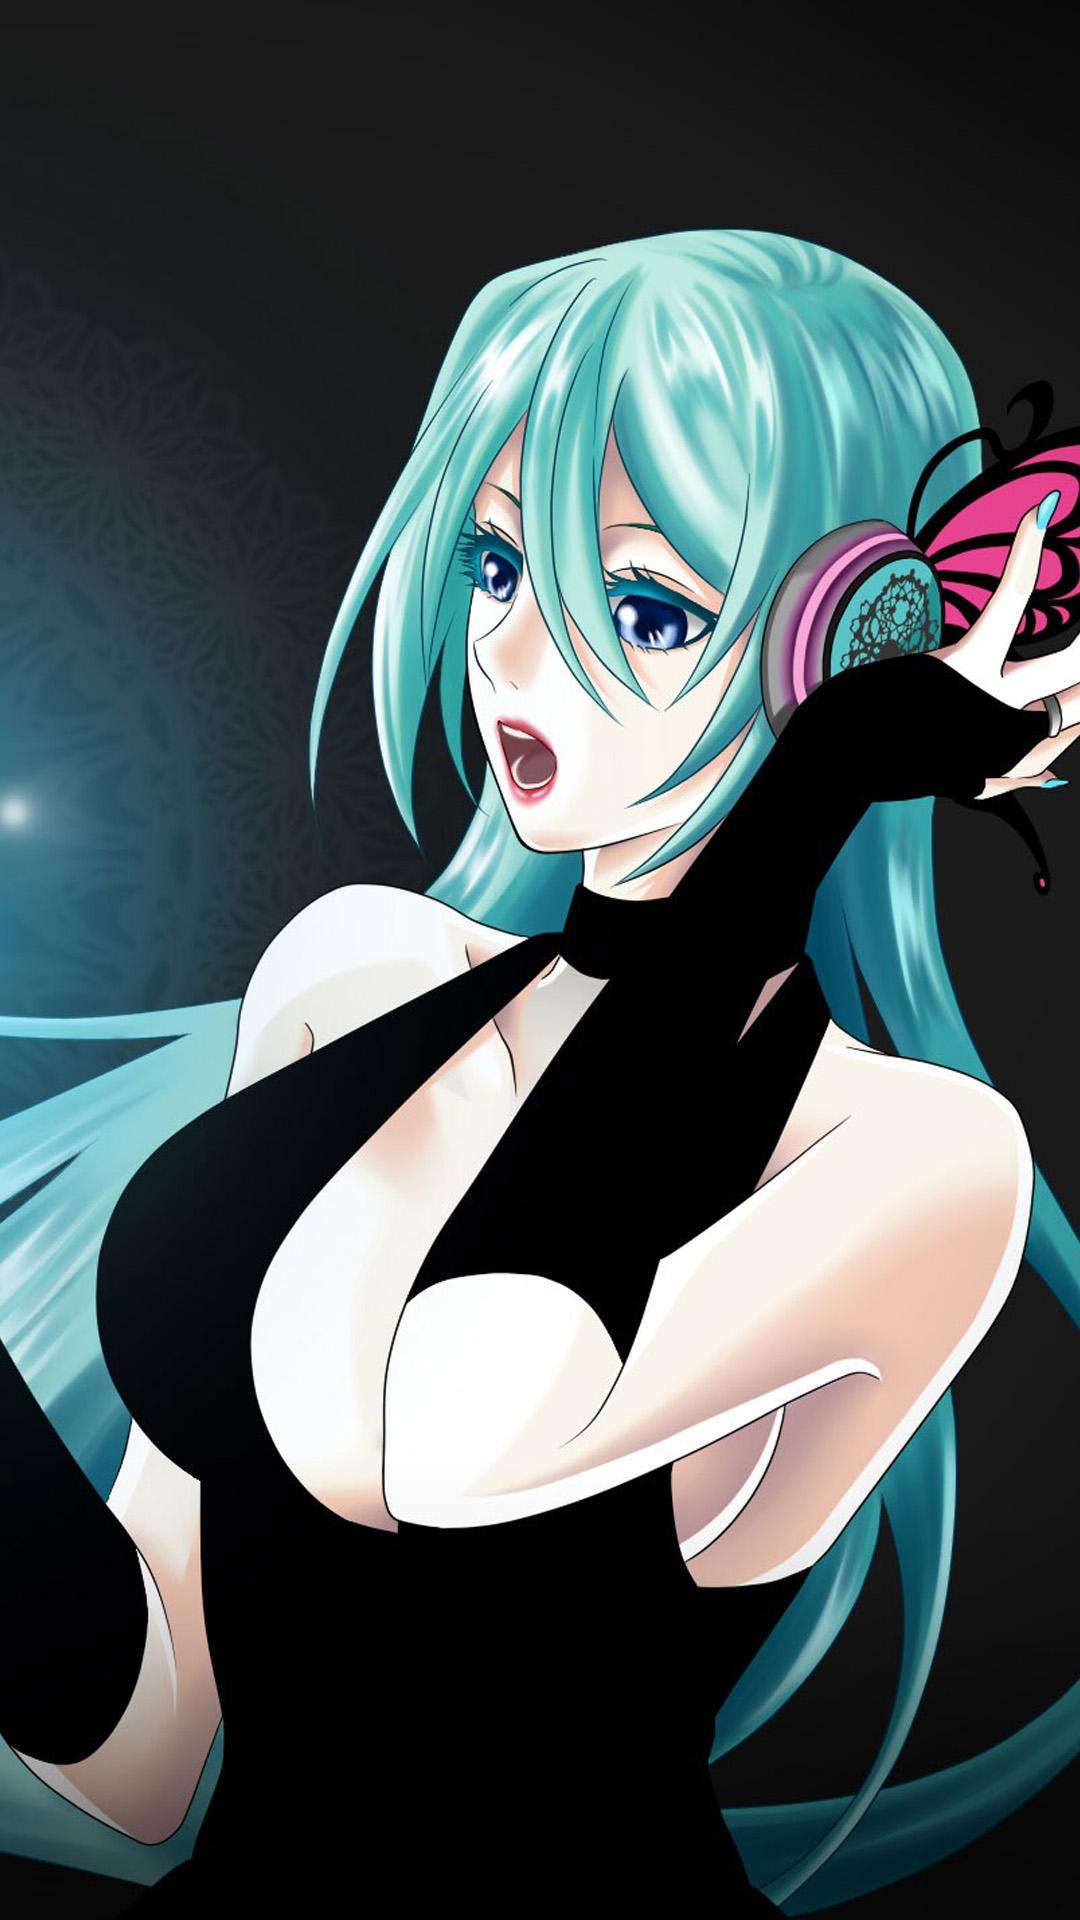 4k Anime Girl Wallpapers Wallpapers Hd Anime Fondos De Pantalla